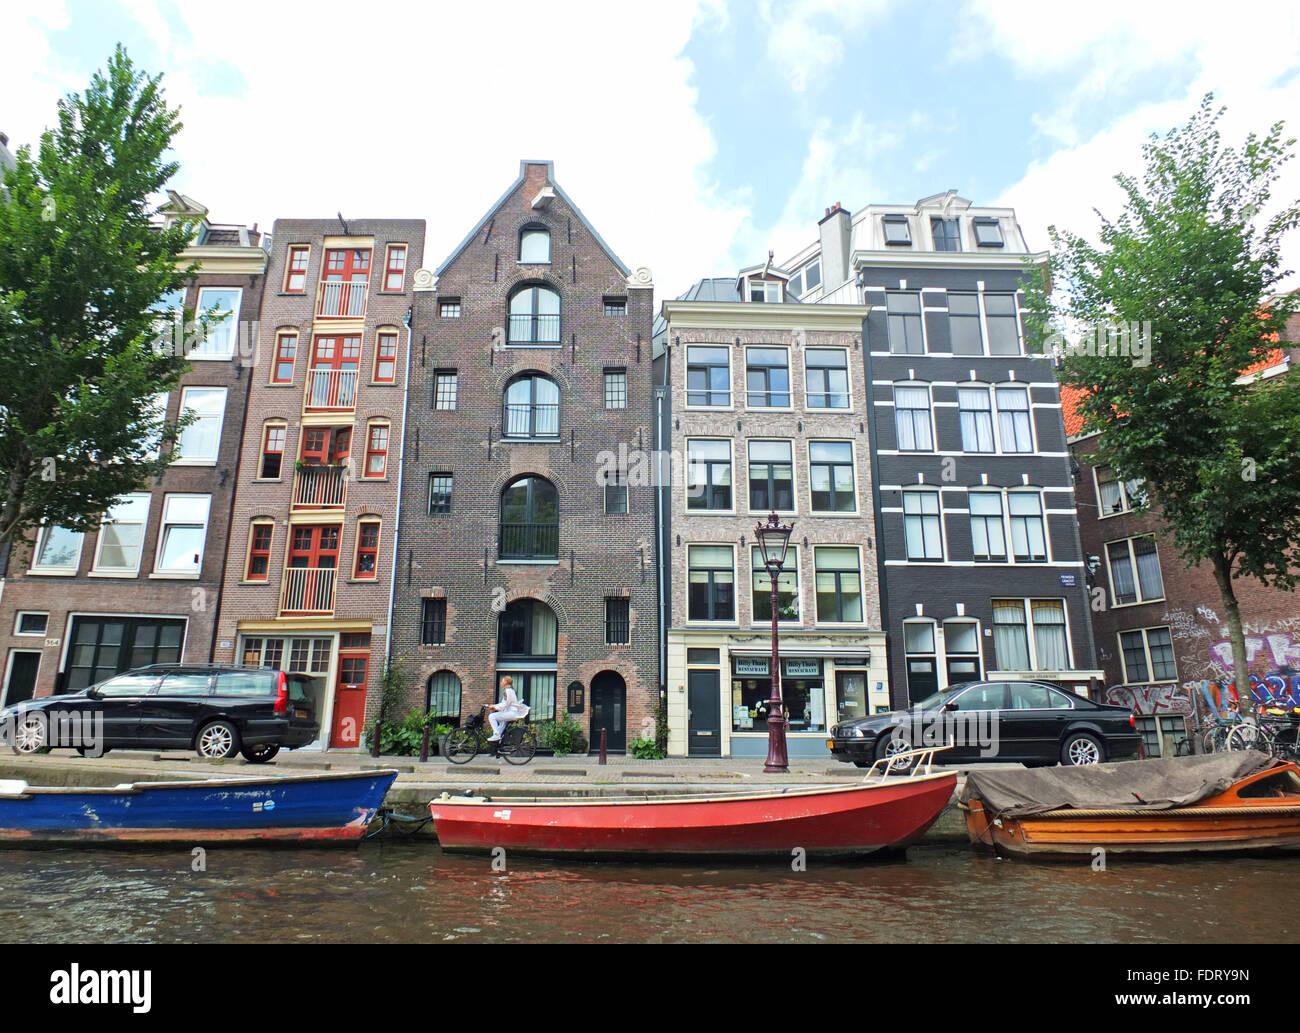 Amsterdam Banque D'Images